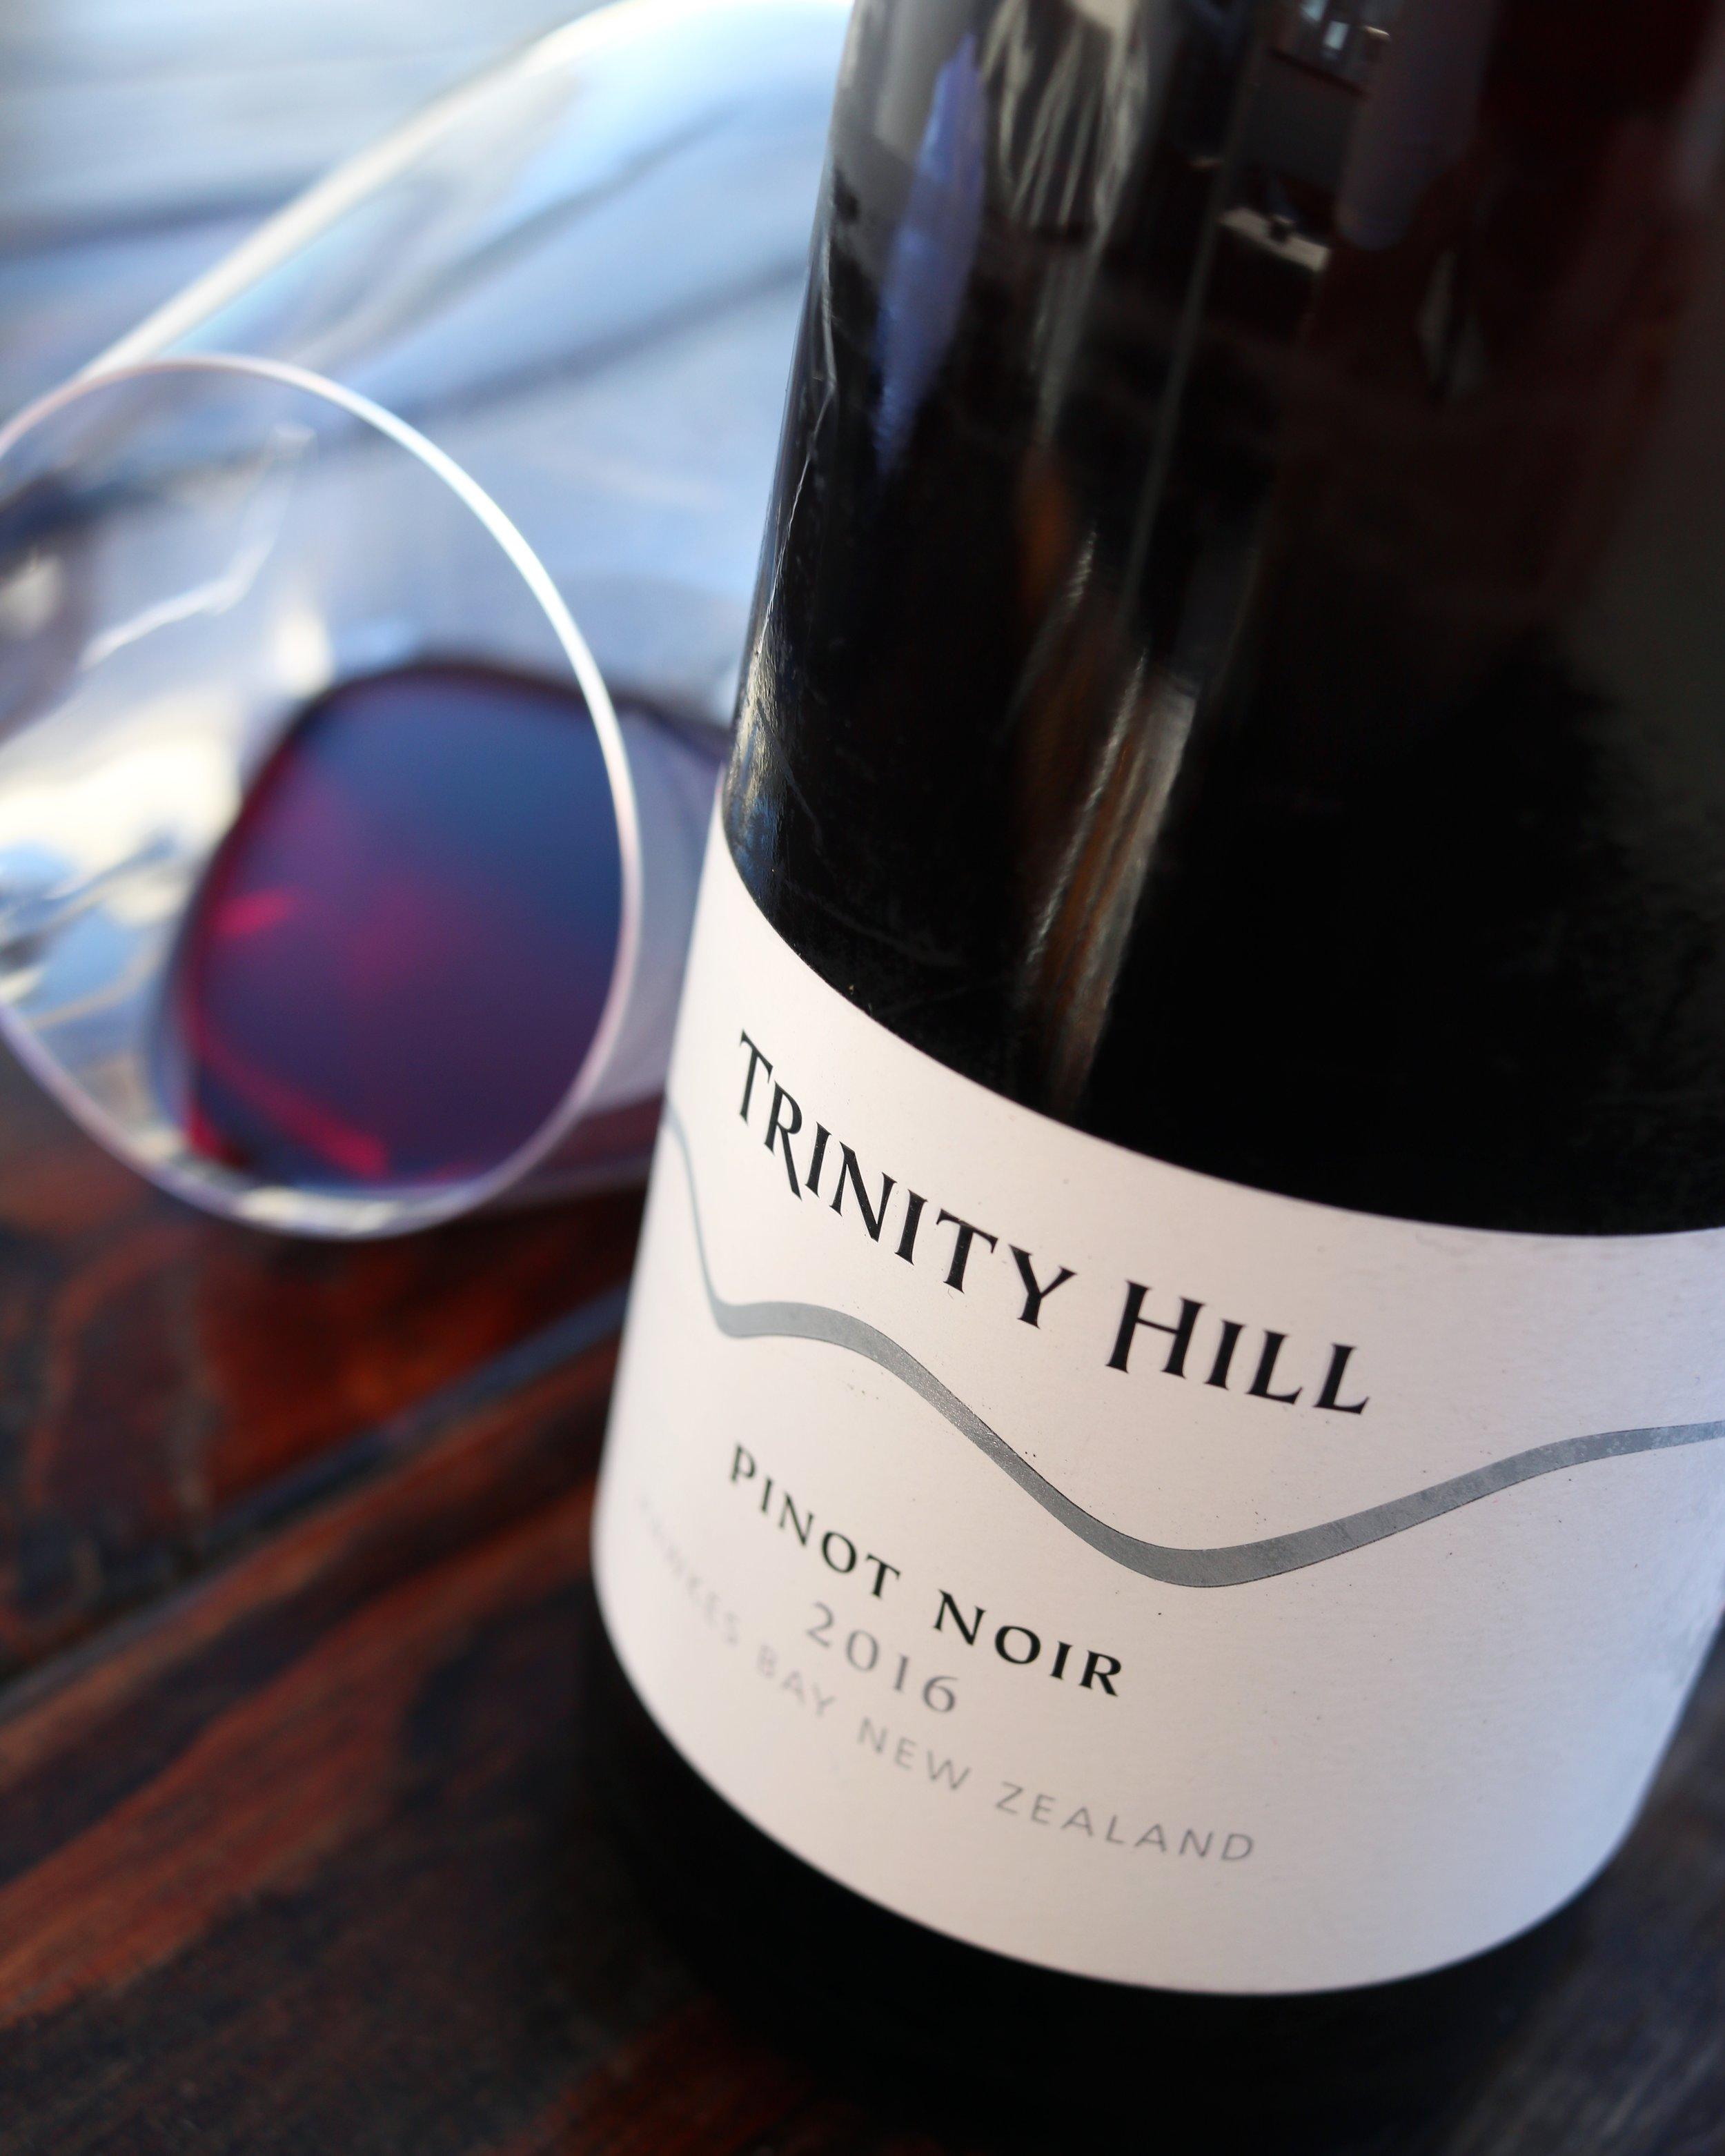 Trinity Hill Pinot Noir.jpg